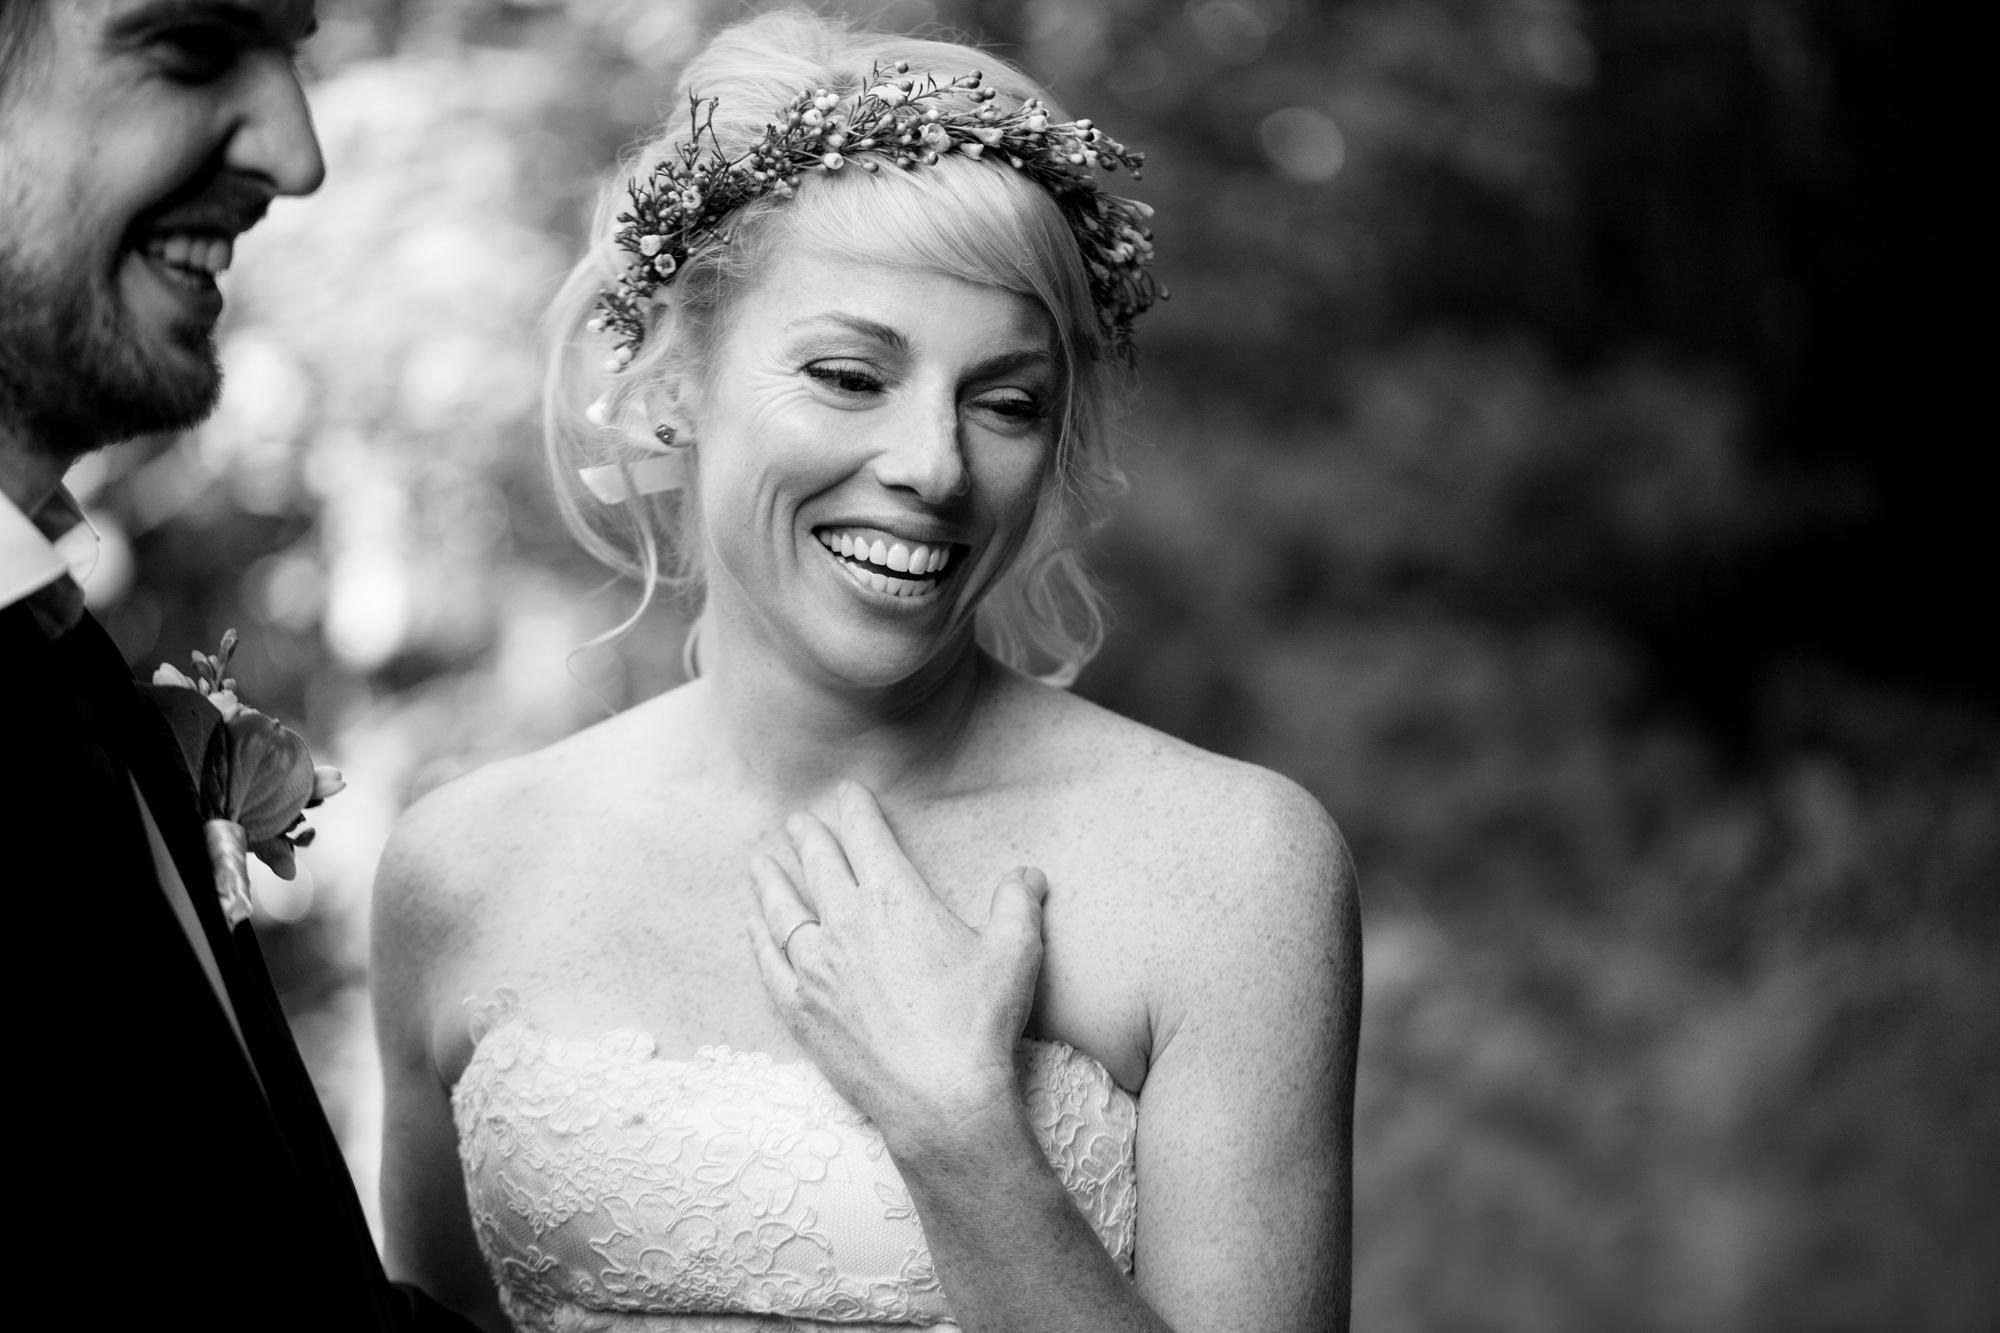 edmonton calgary alberta wedding photographer66.jpg